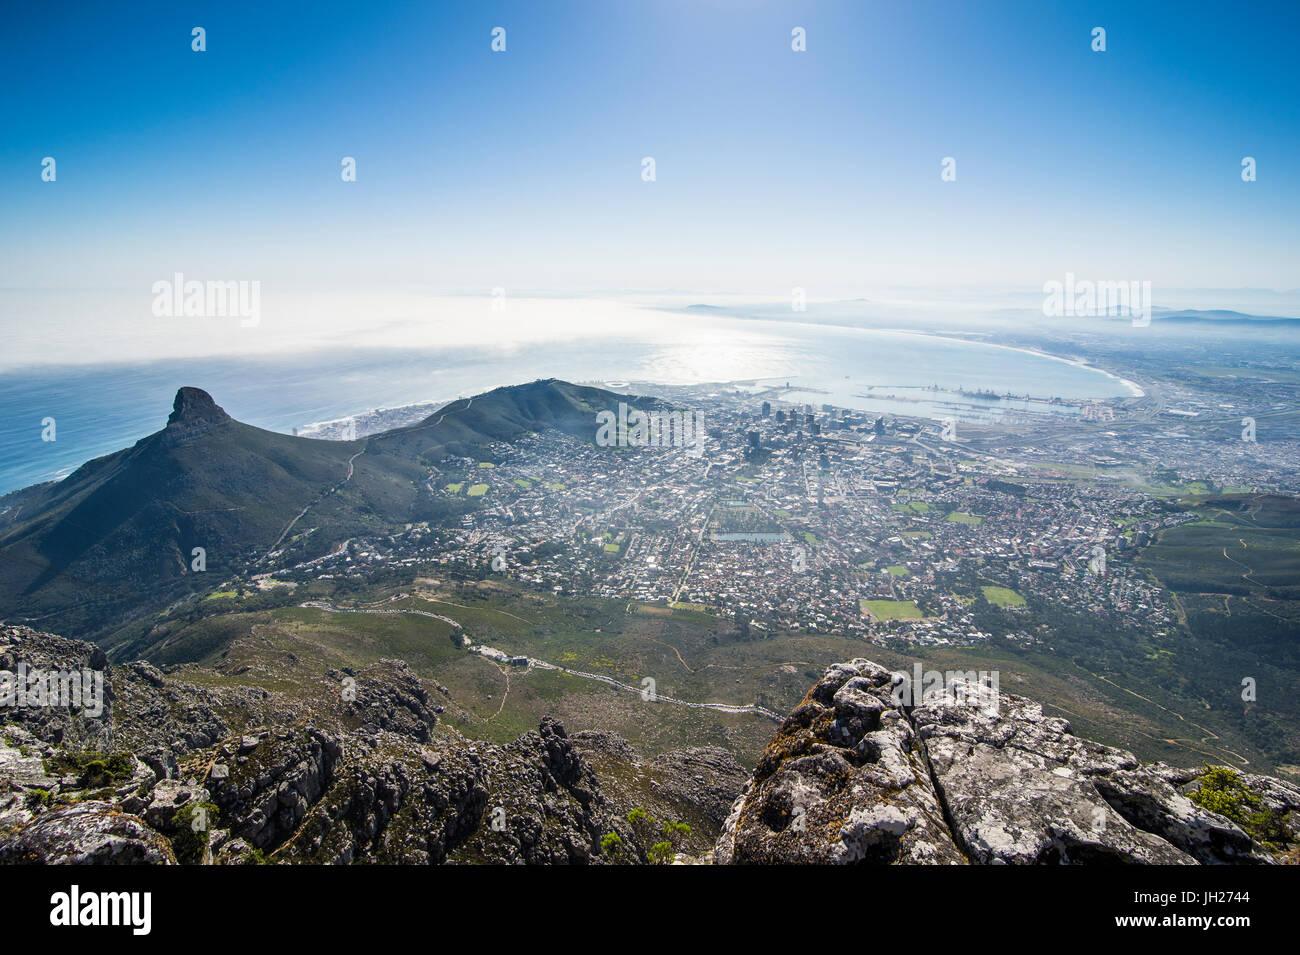 Blick auf Kapstadt vom Tafelberg, Südafrika, Afrika Stockbild